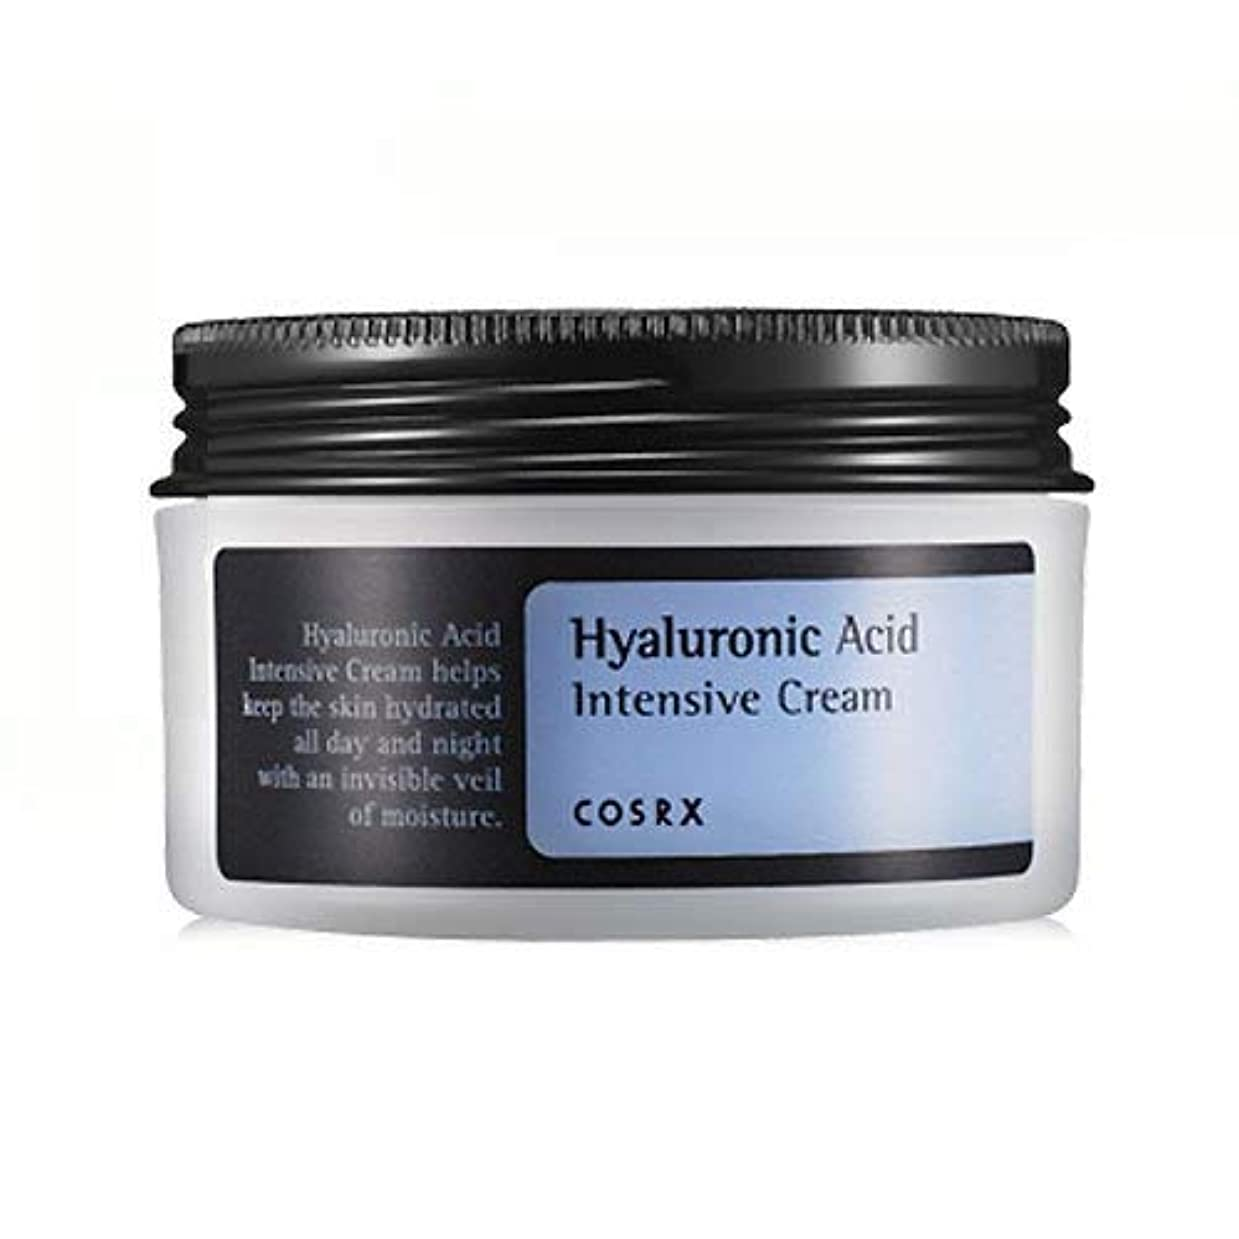 創傷市長装置COSRX Hyaluronic Acid Intensive Cream 100g/Korea Cosmetics [並行輸入品]